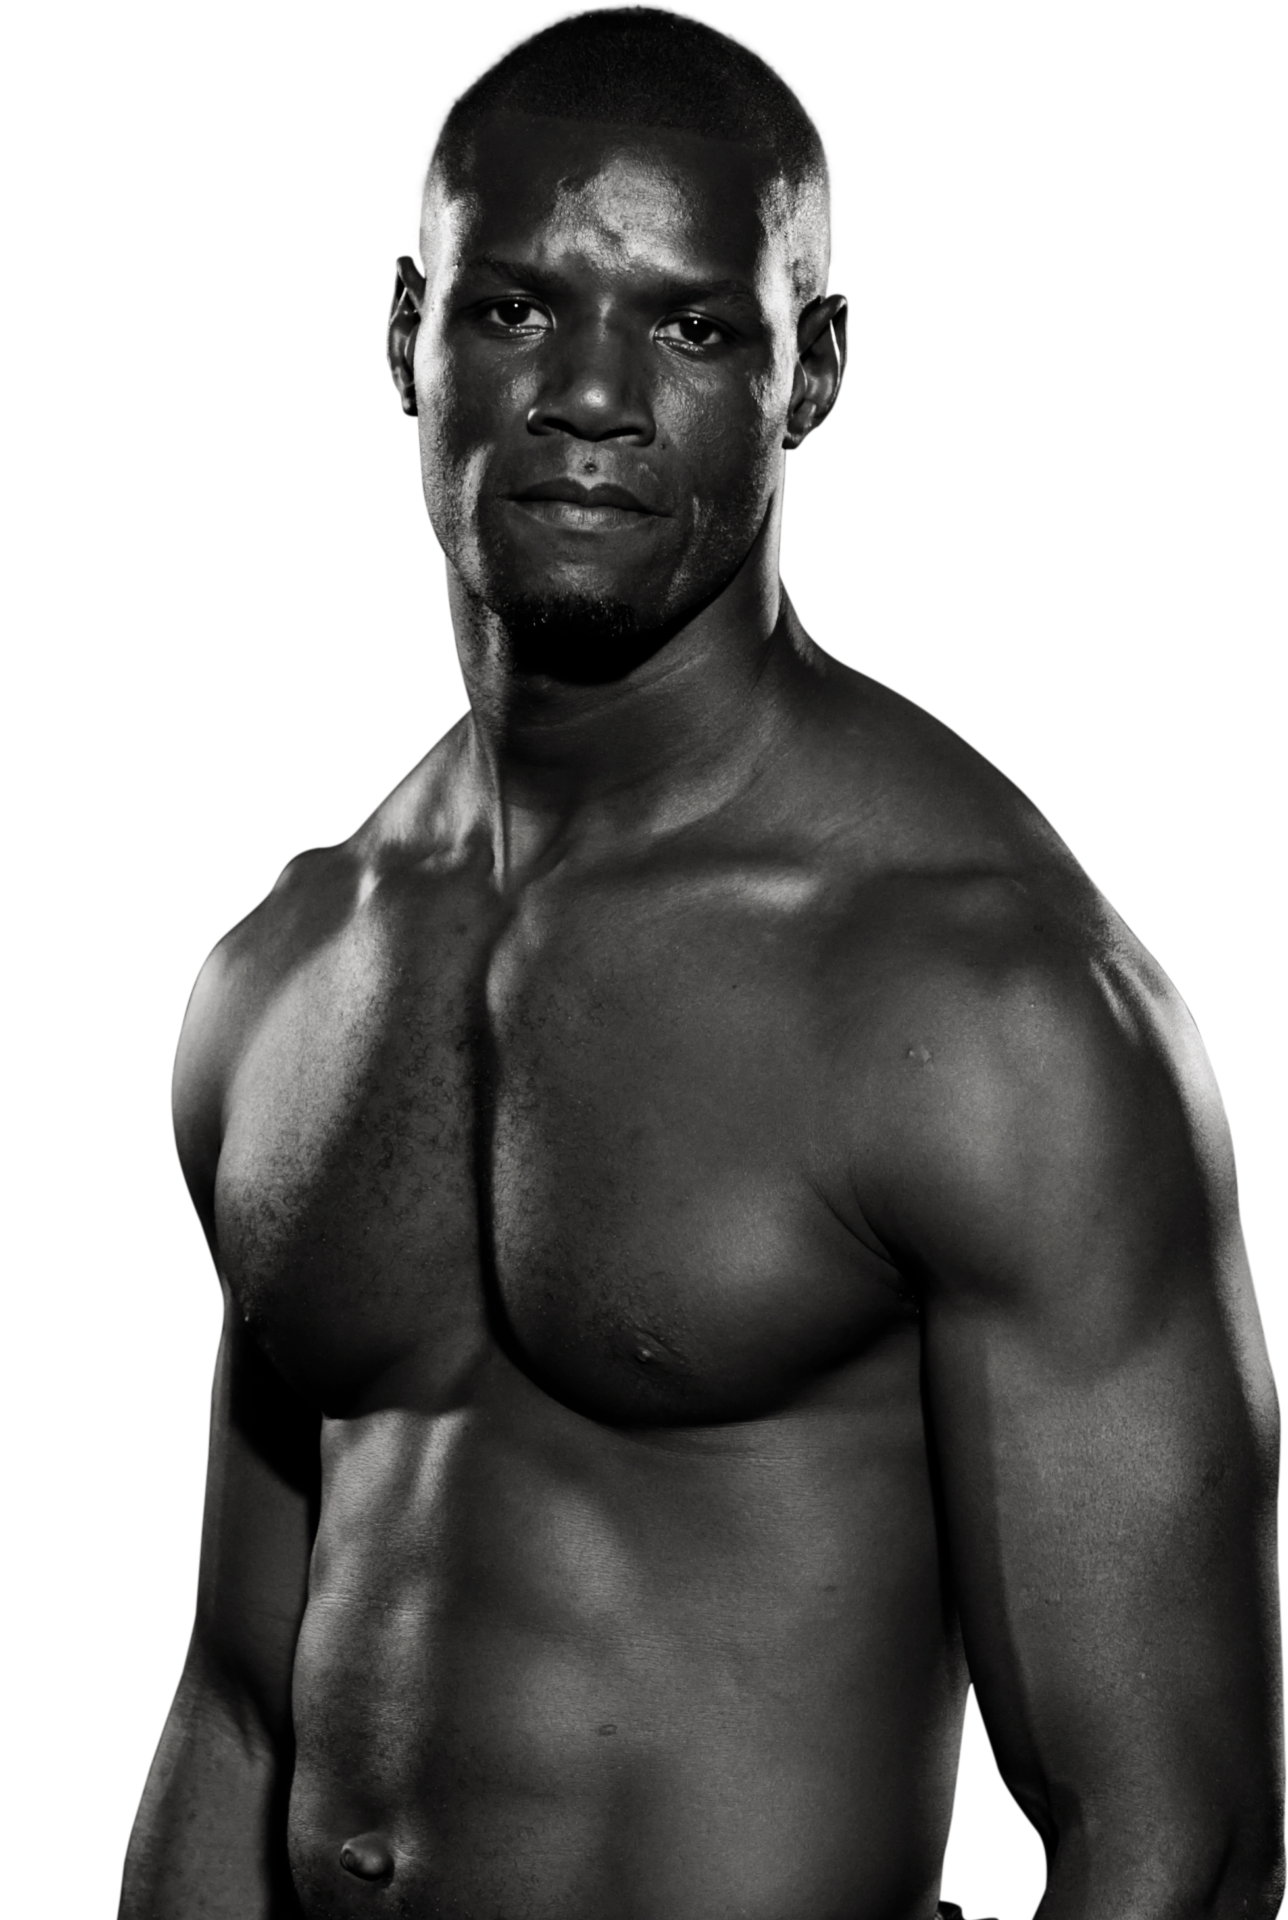 Moussa Togola